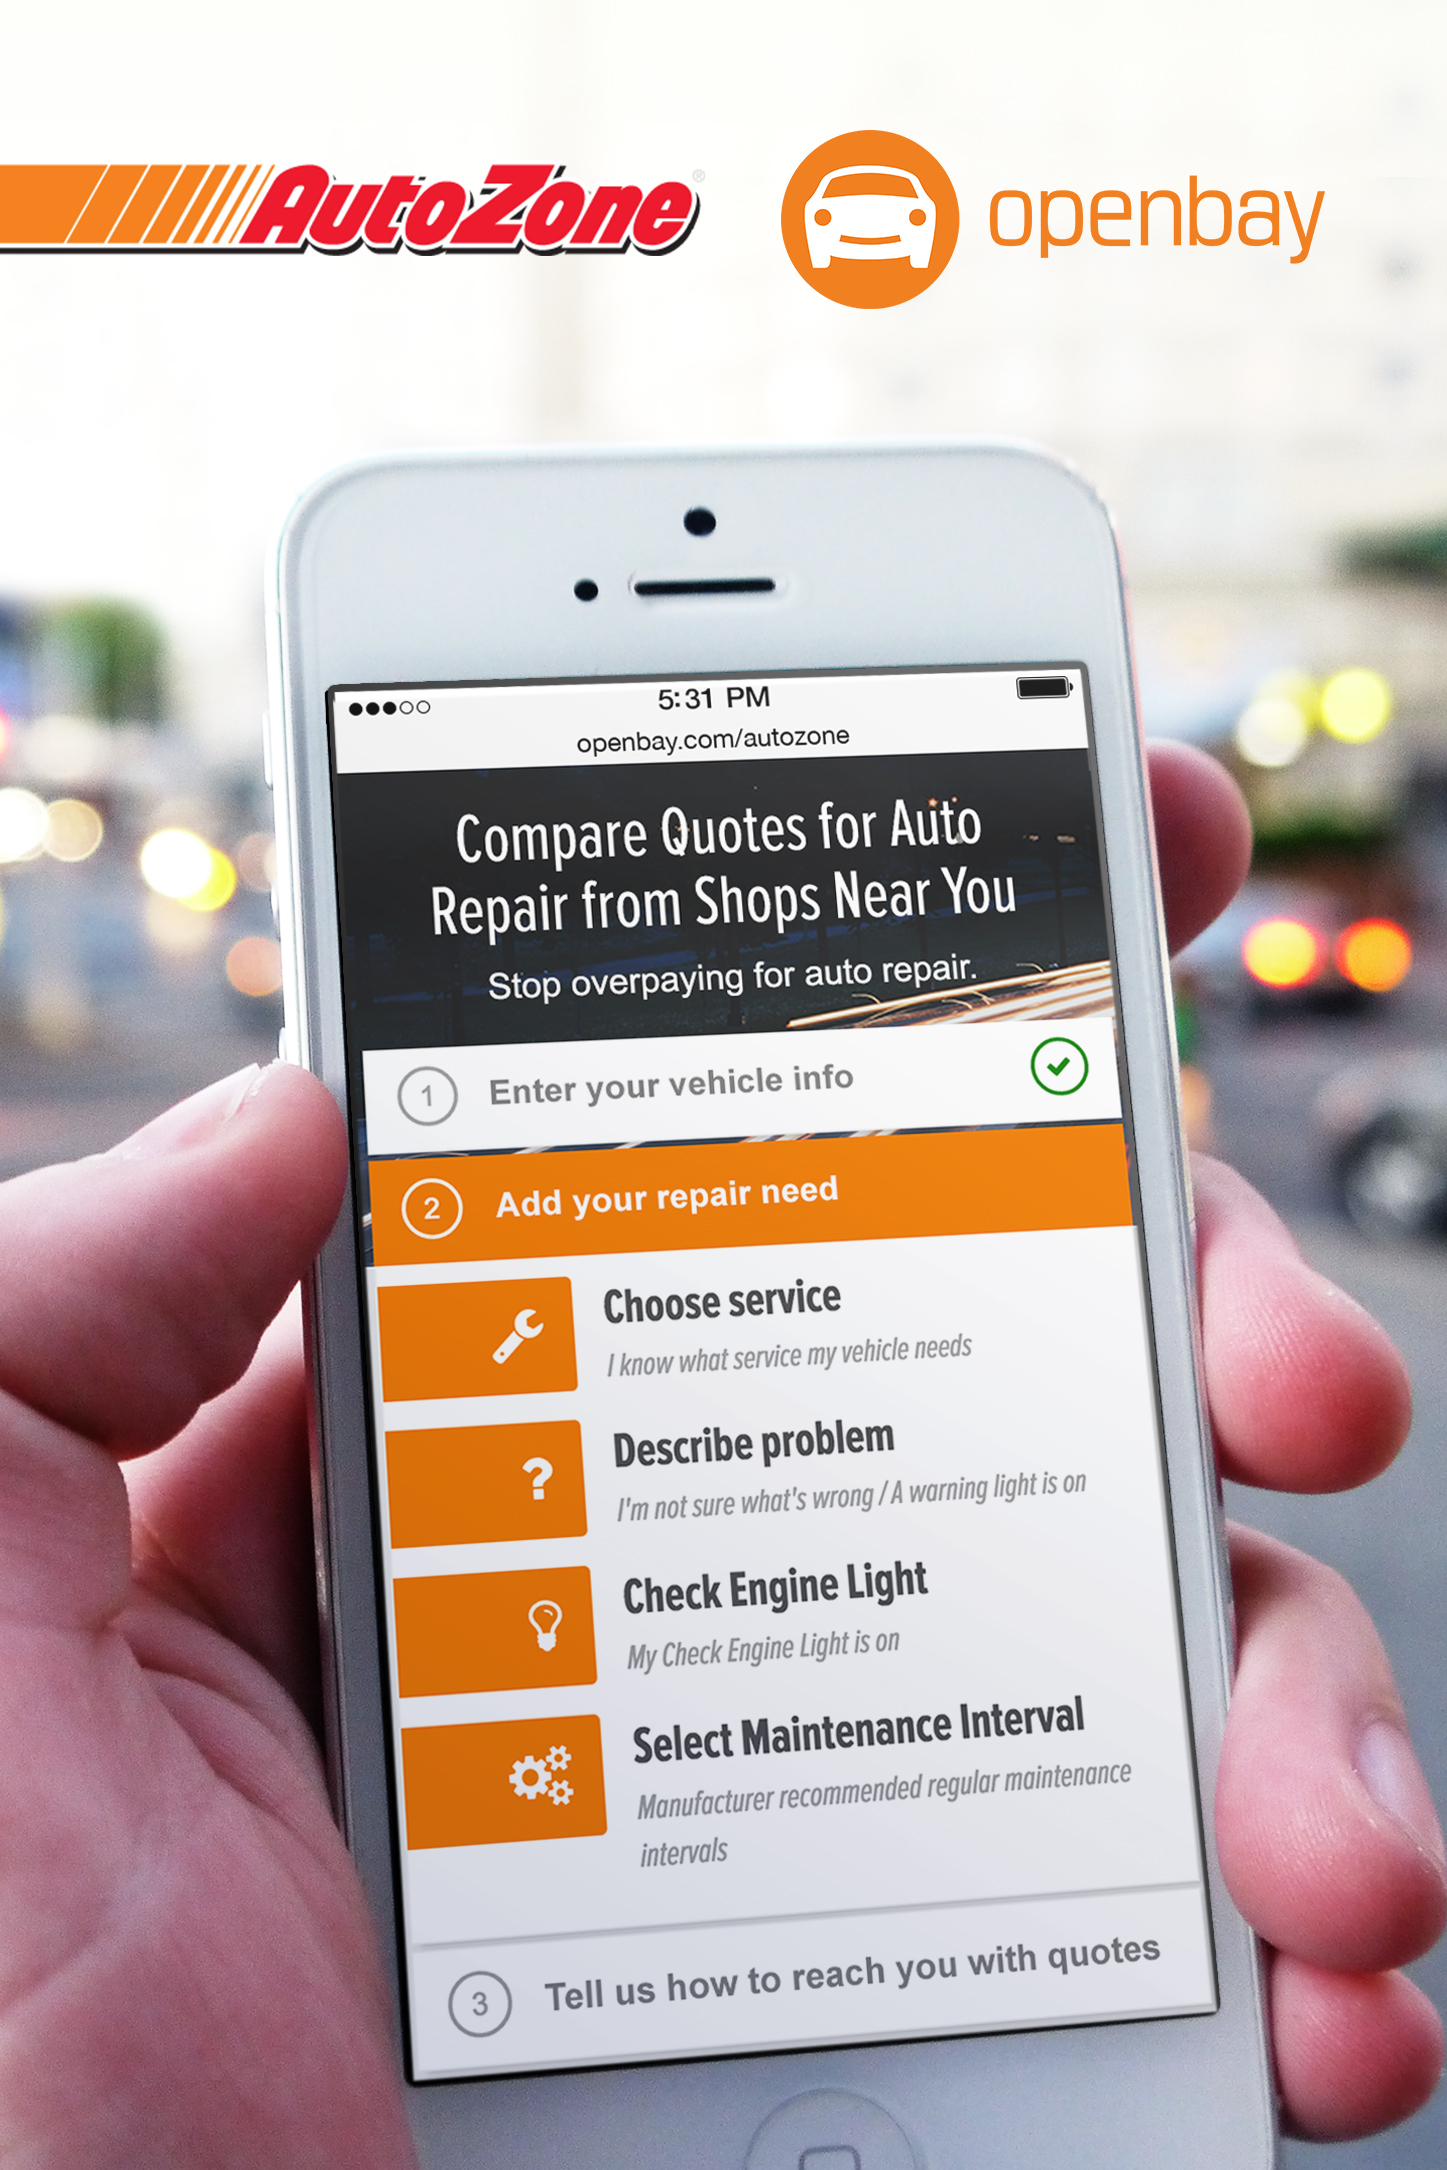 Openbay-powers-AutoZone-online-auto-repair-service-in-Beantown